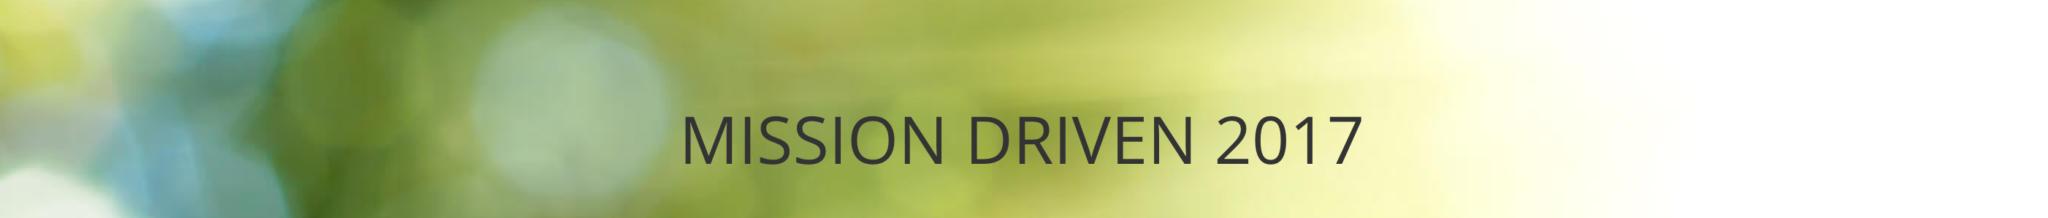 Mission Driven 2017